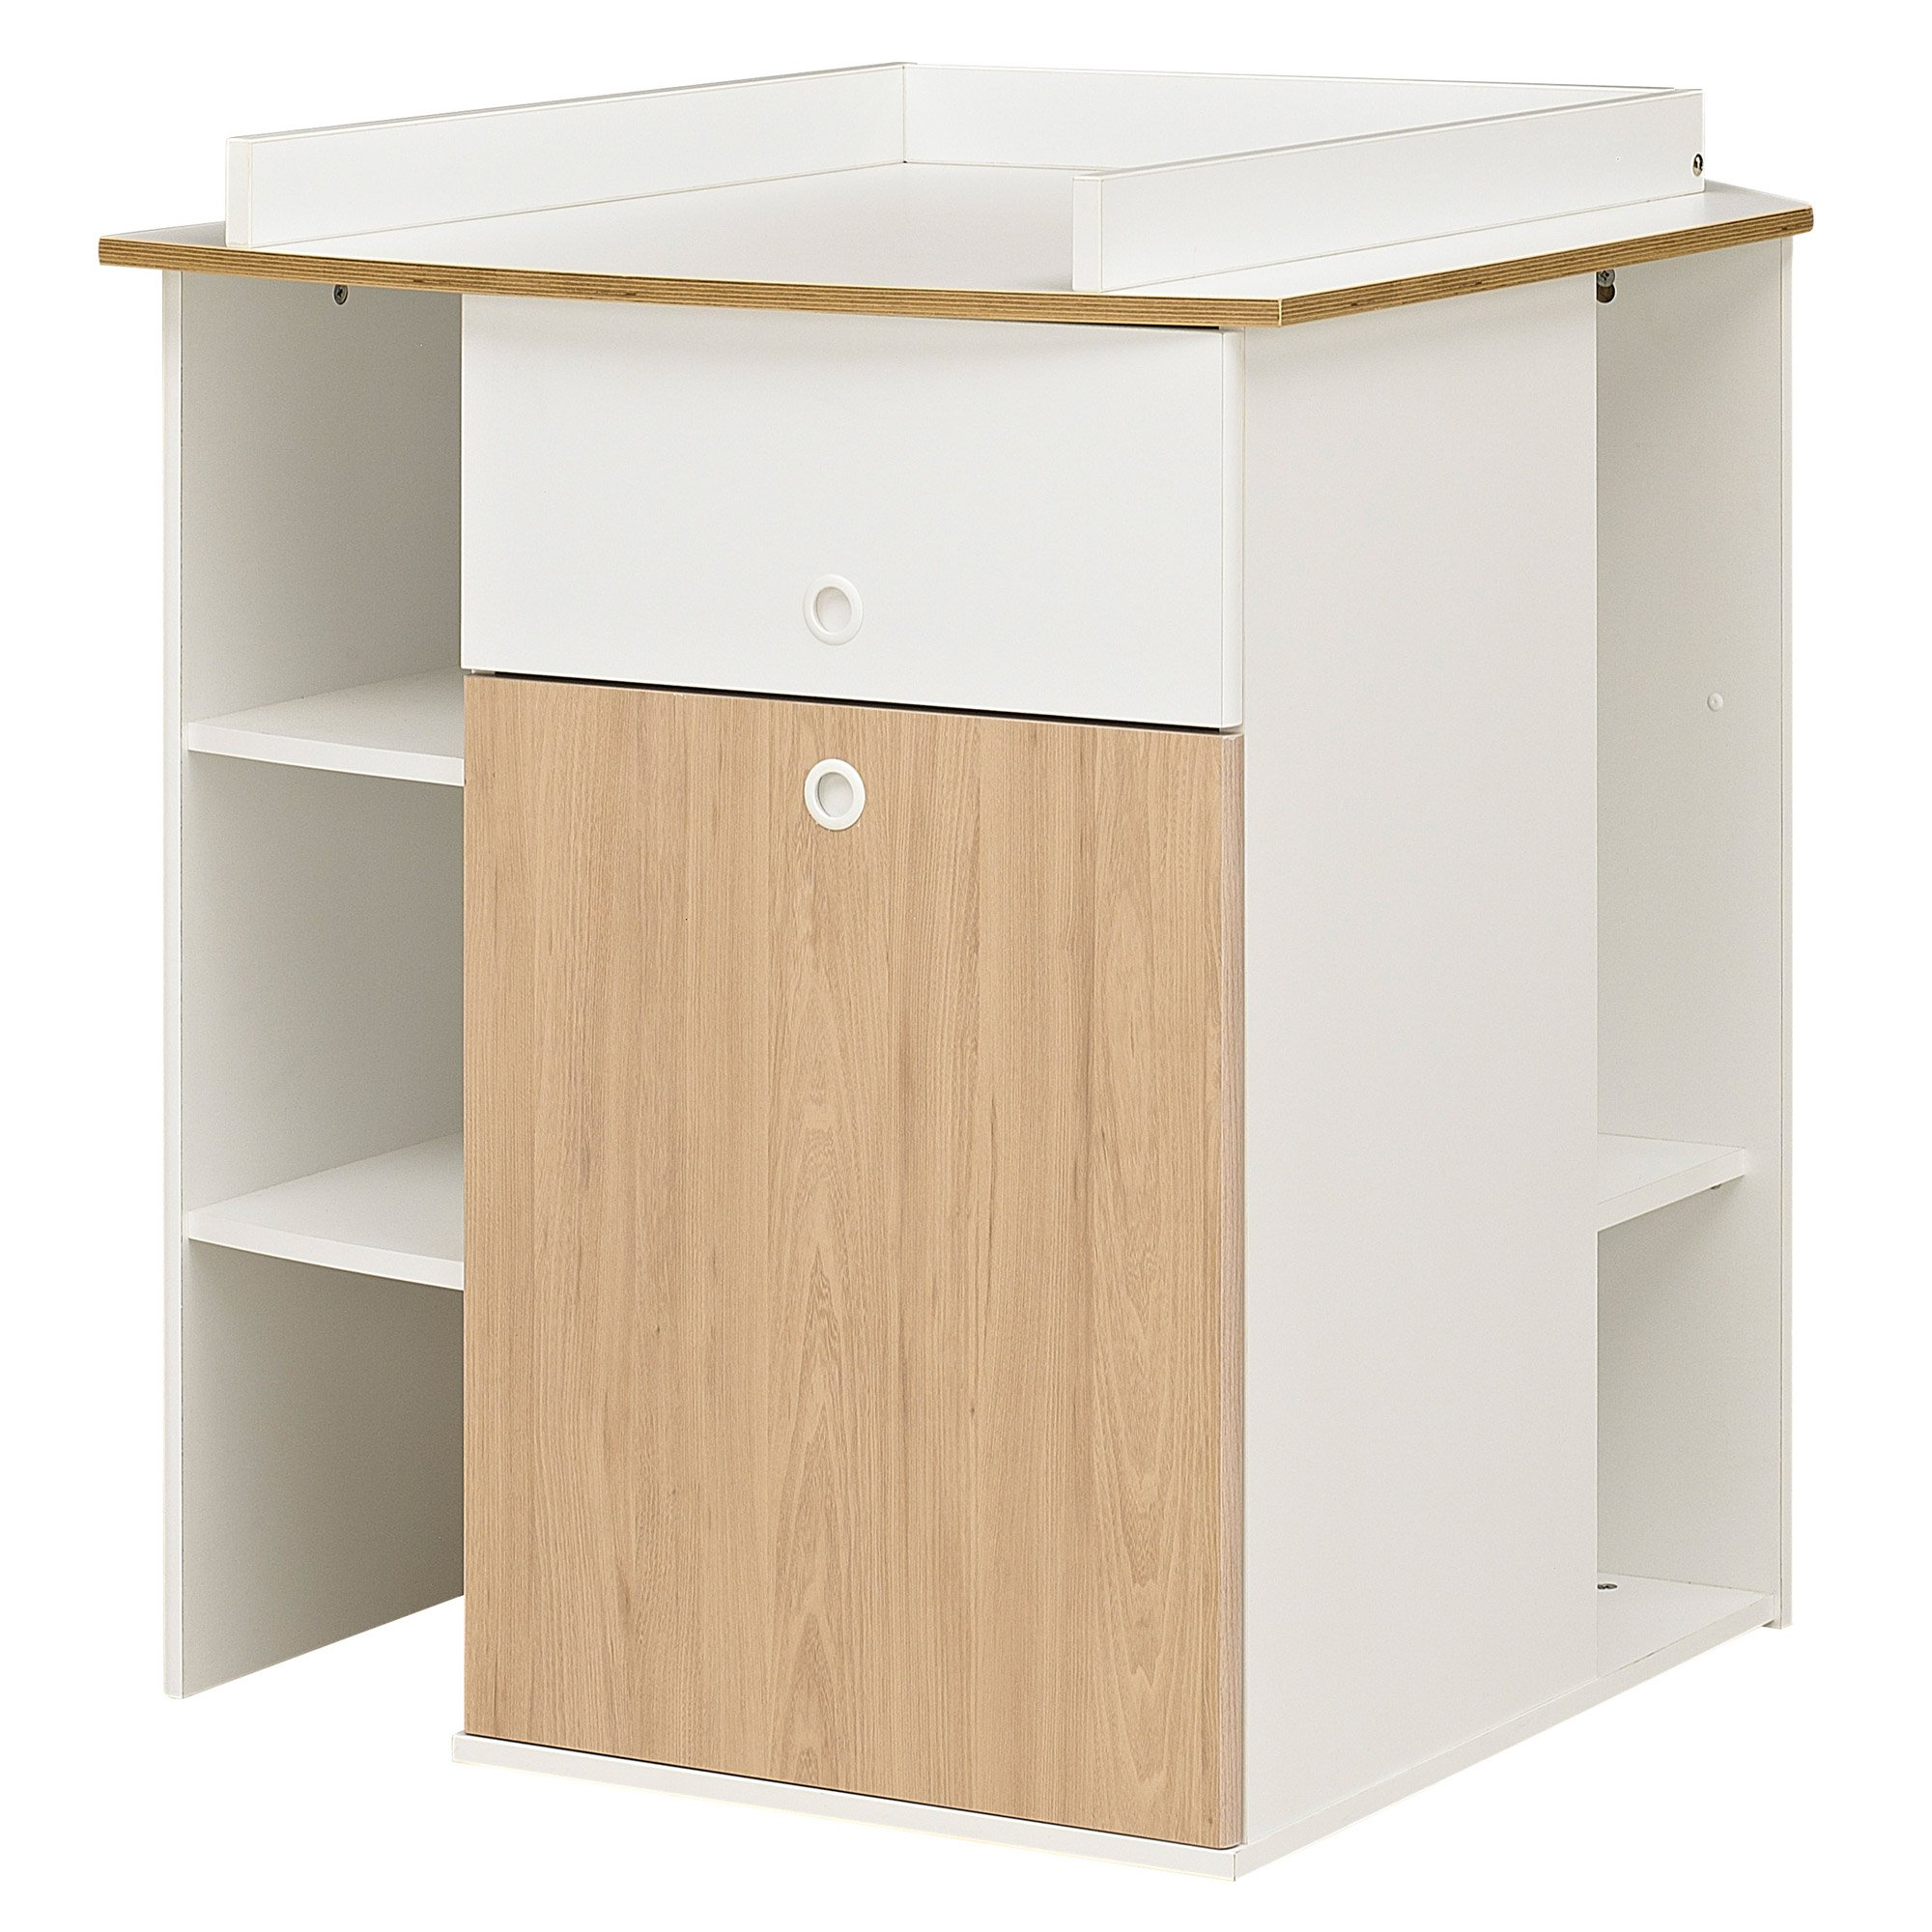 meuble langer d 39 angle 2 en 1 de galipette meuble langer aubert. Black Bedroom Furniture Sets. Home Design Ideas